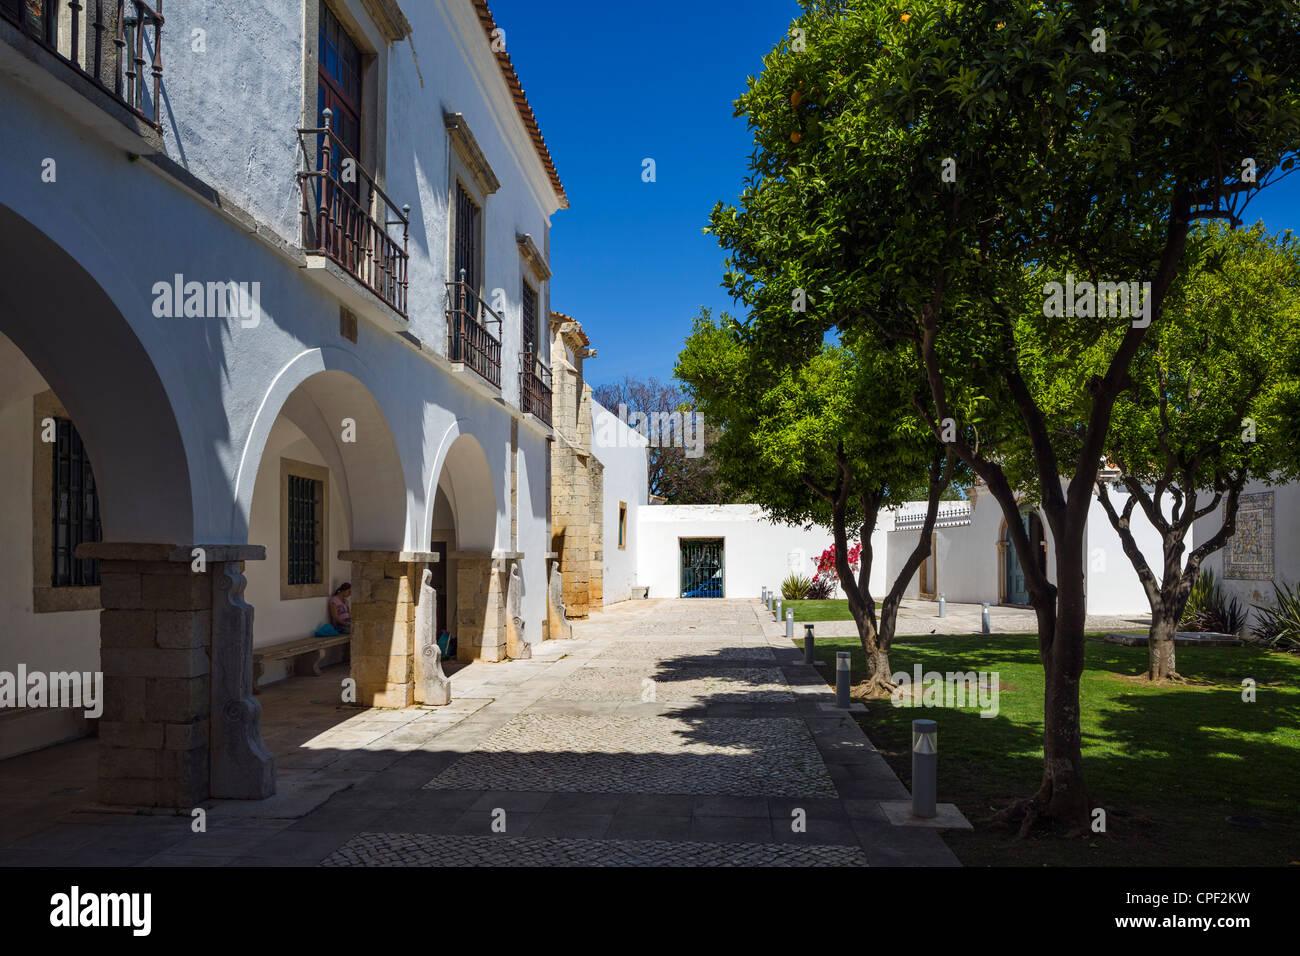 Courtyard in the Se (Cathedral) in the Old Town (Cidade Velha or Vila Adentro), Faro, Algarve, Portugal Stock Photo